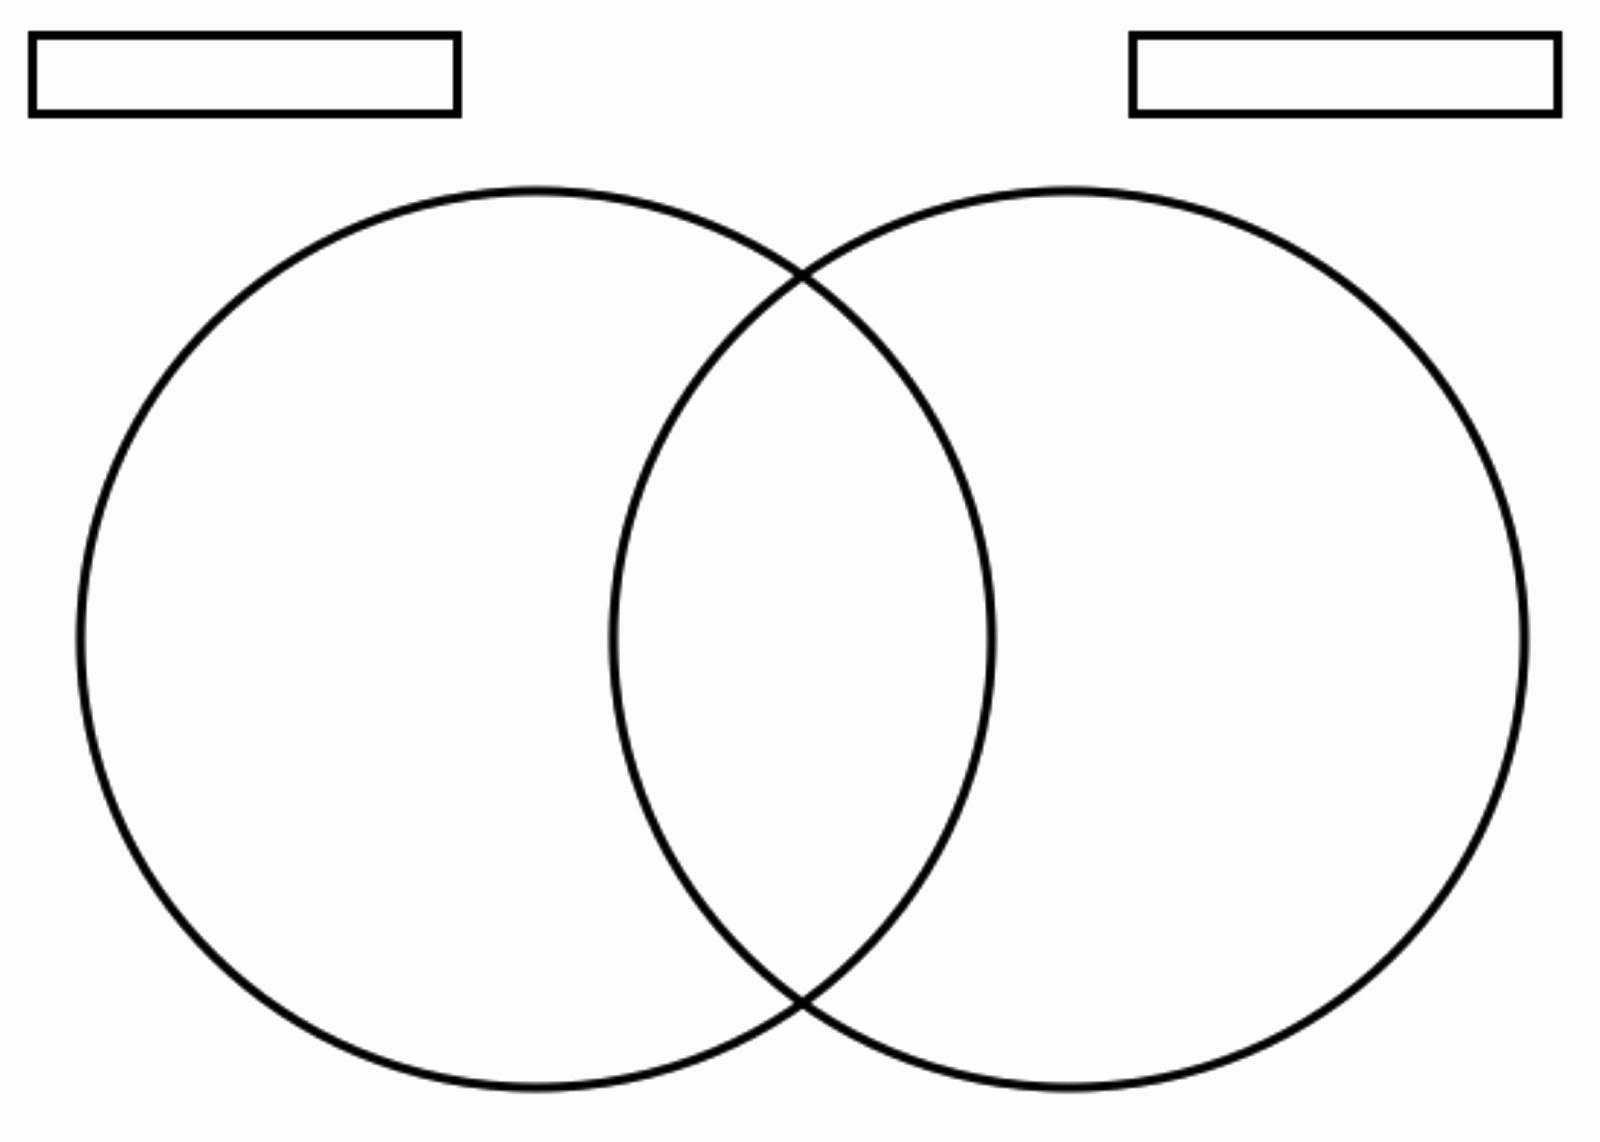 Venn Diagram Template Editable Unique Creating A Venn Diagram Template